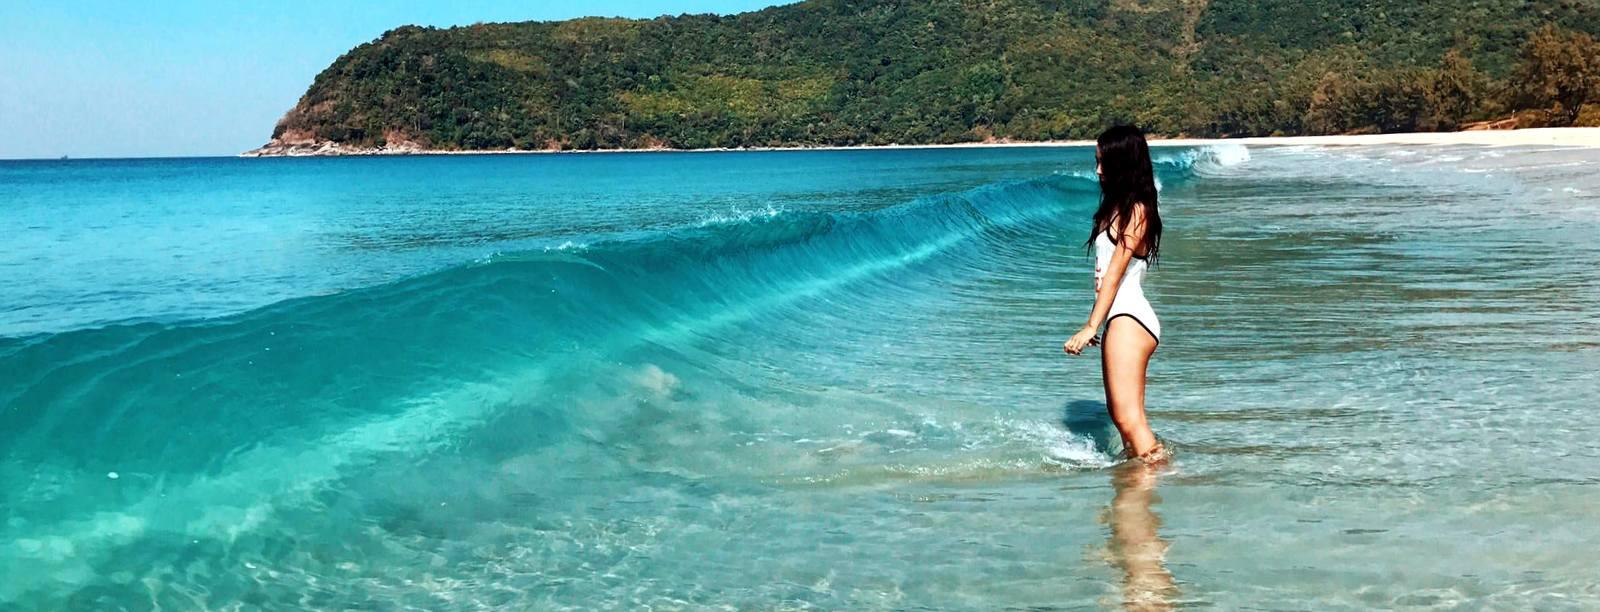 sinhtauk-beach-clear-water-dawei-myanmar-1